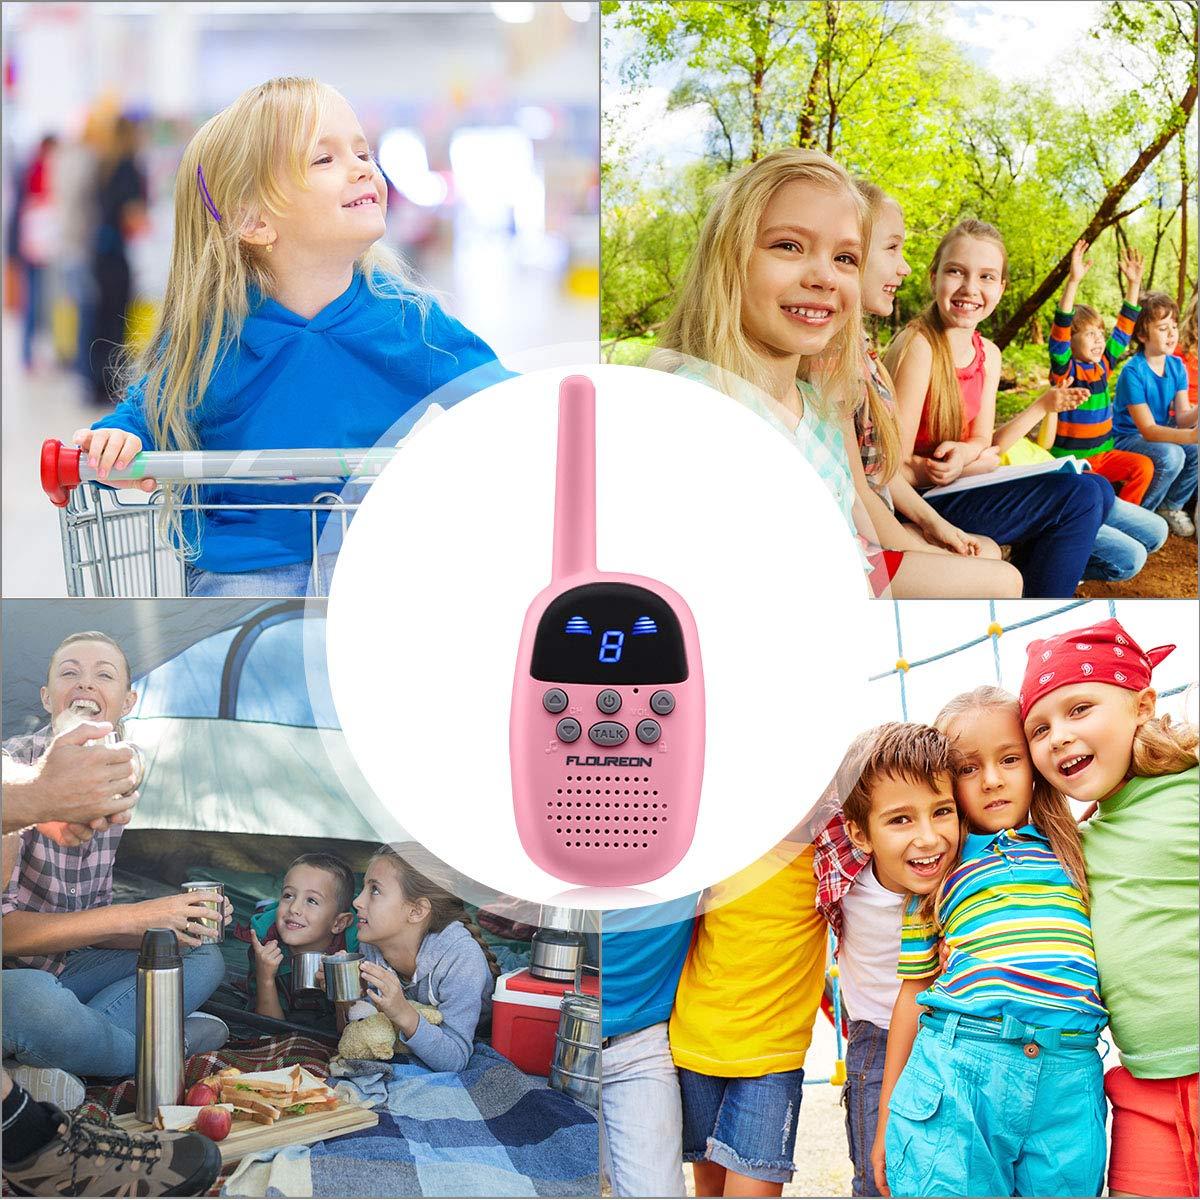 Spronto Kids Walkie Talkies 9 Channel Two Way Radio Twins Walkie Talkies FRS//GMRS Handheld Interphone Long Range for Trips Outdoor Activities Blue